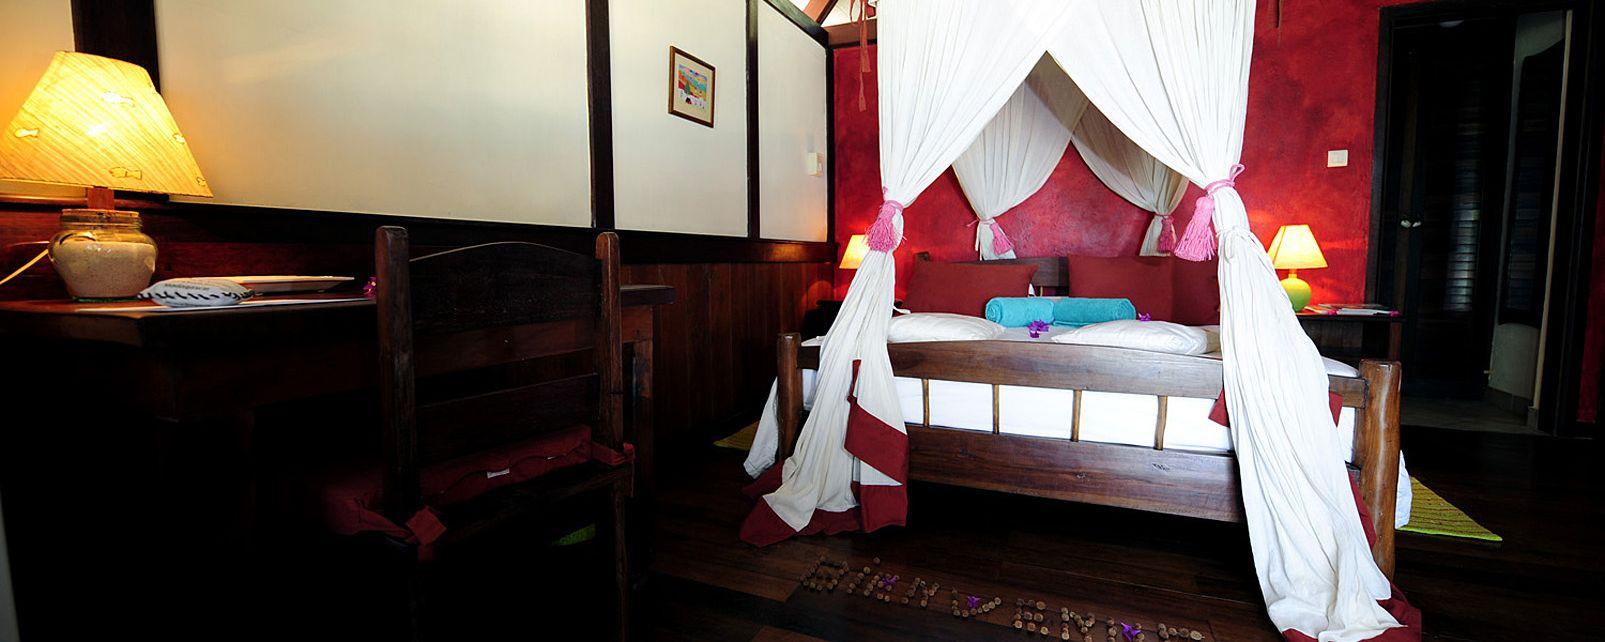 Hotel Tsarabanjina lhôtel